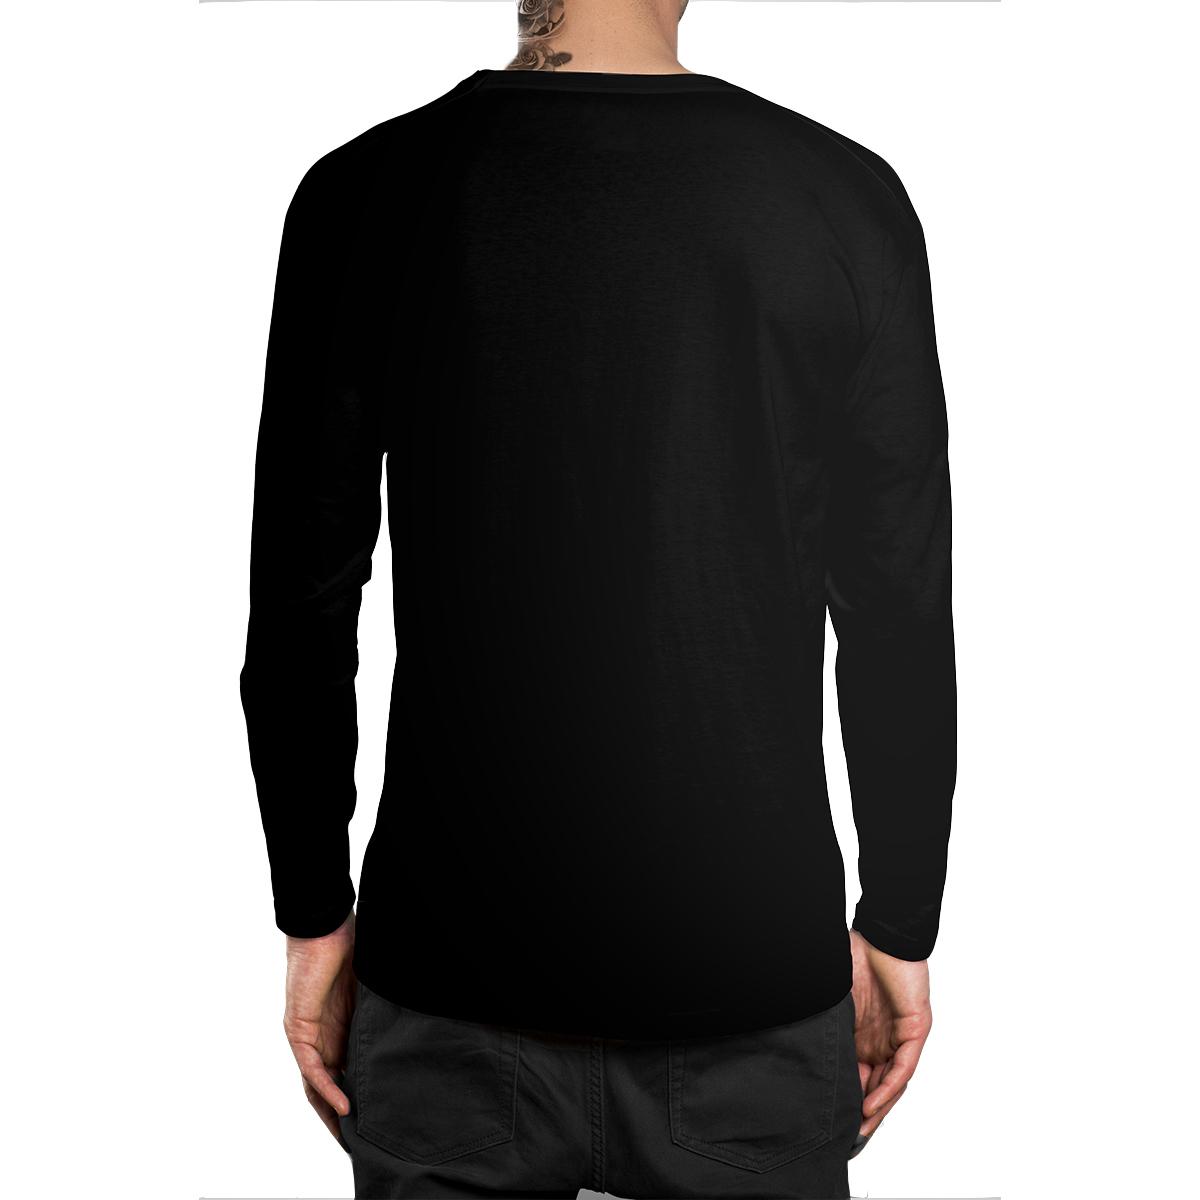 Stompy Camiseta Manga Longa Modelo 54